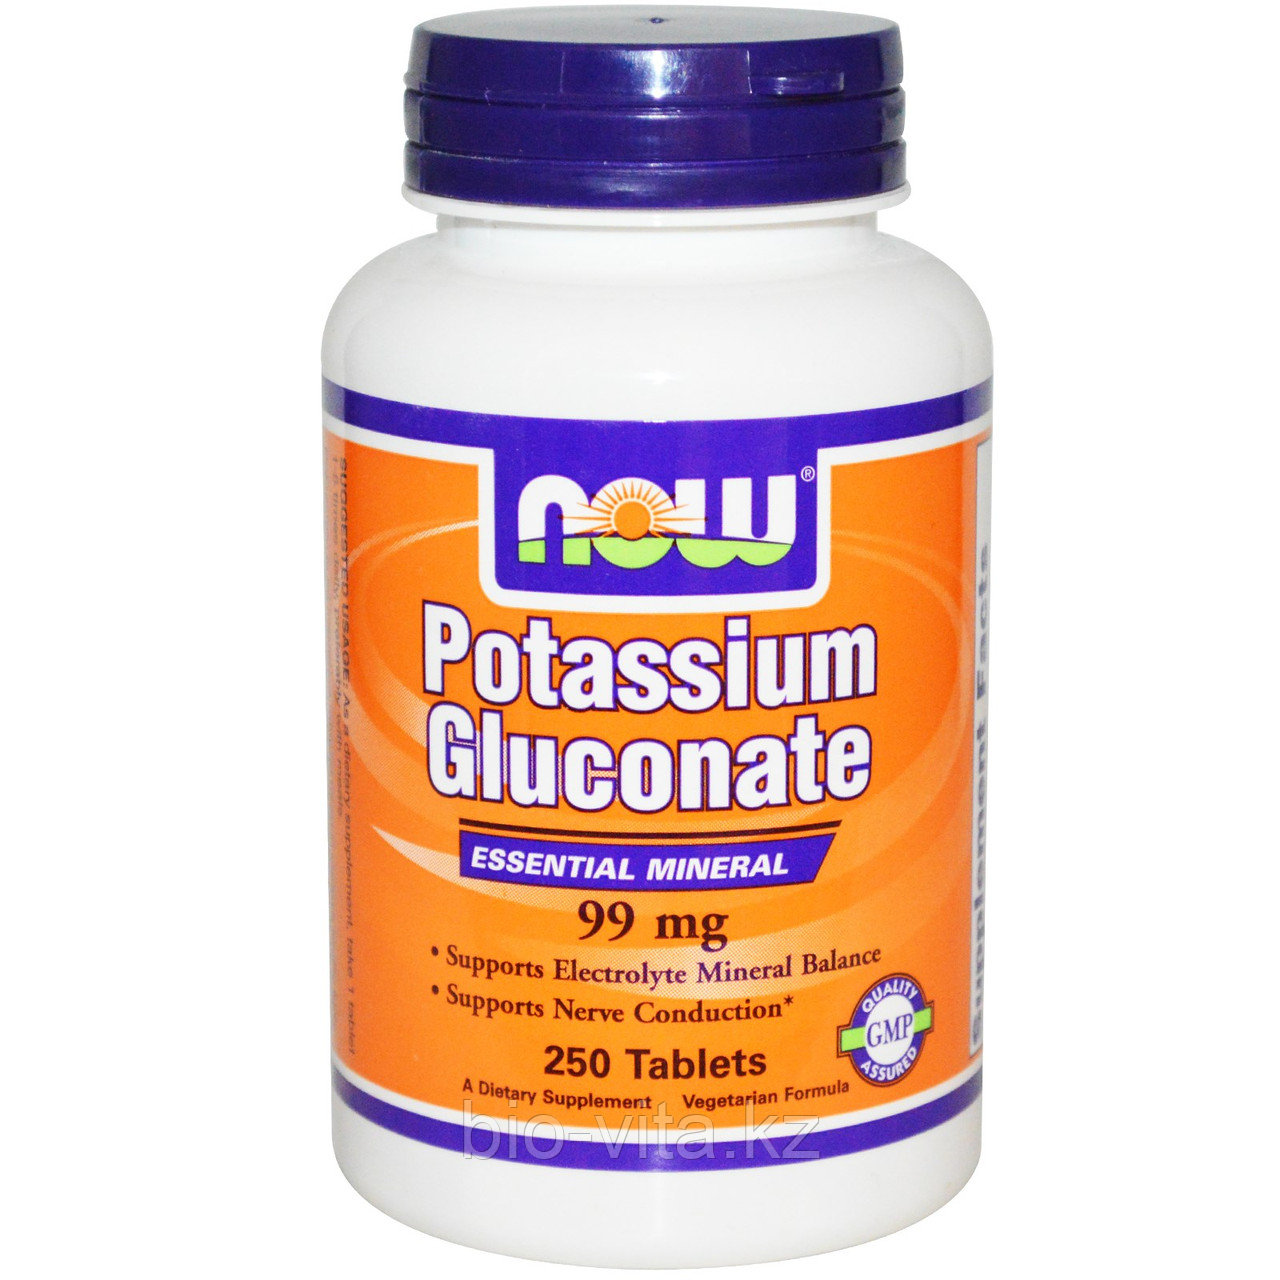 Глюконат калия, 99 мг, 250 таблеток. Now Foods